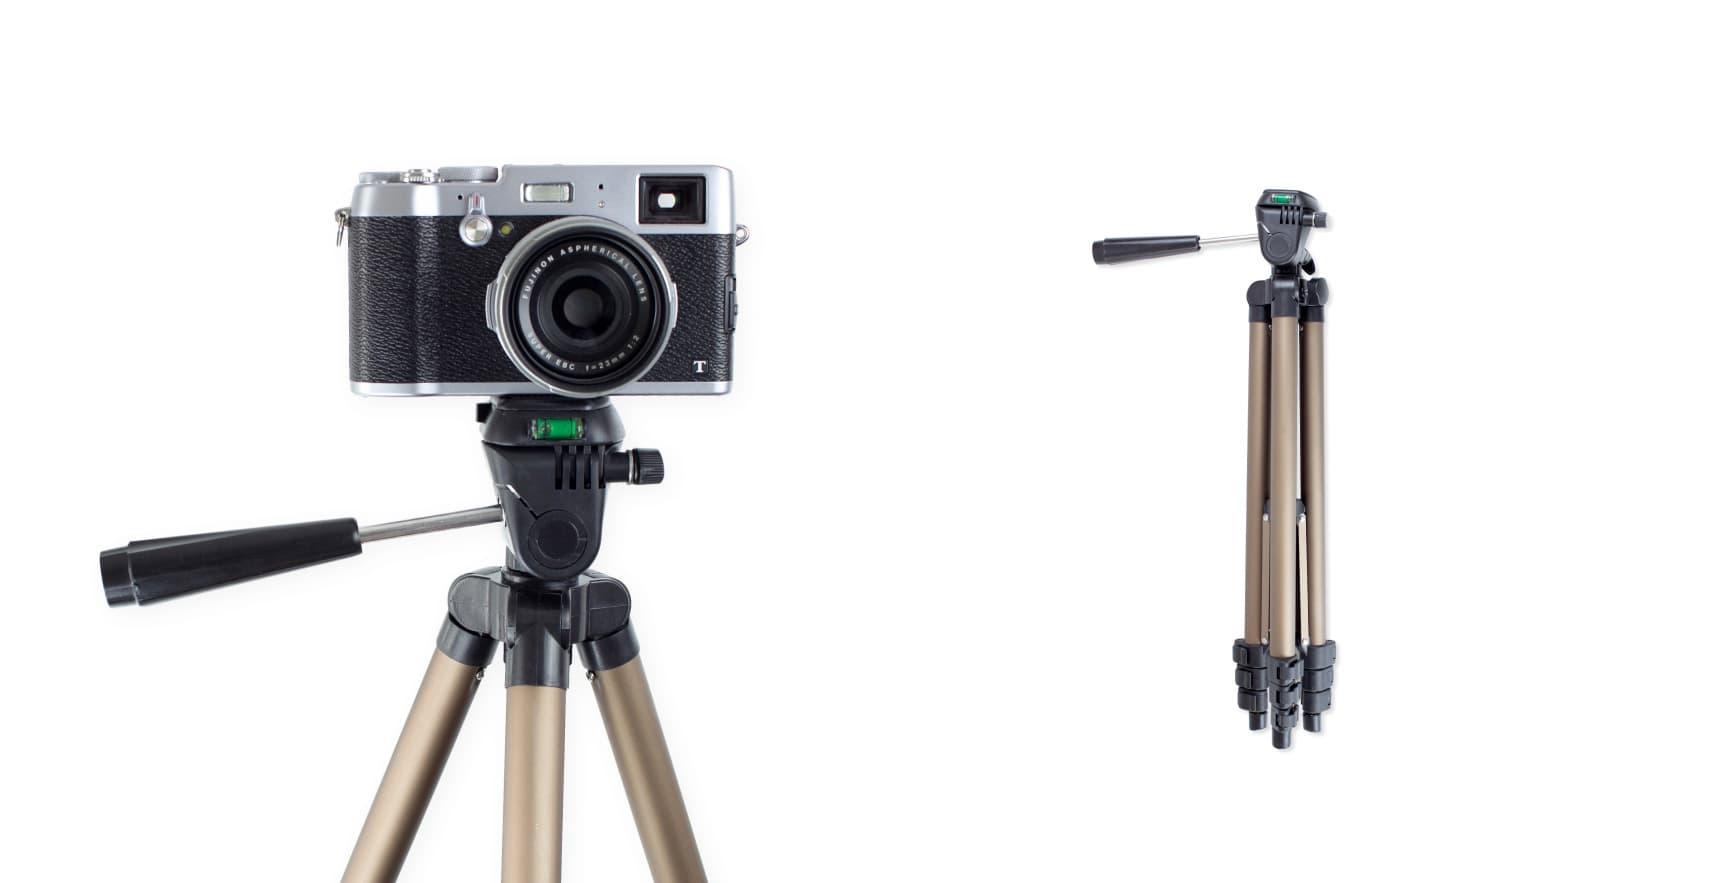 A cheap tripod with a camera